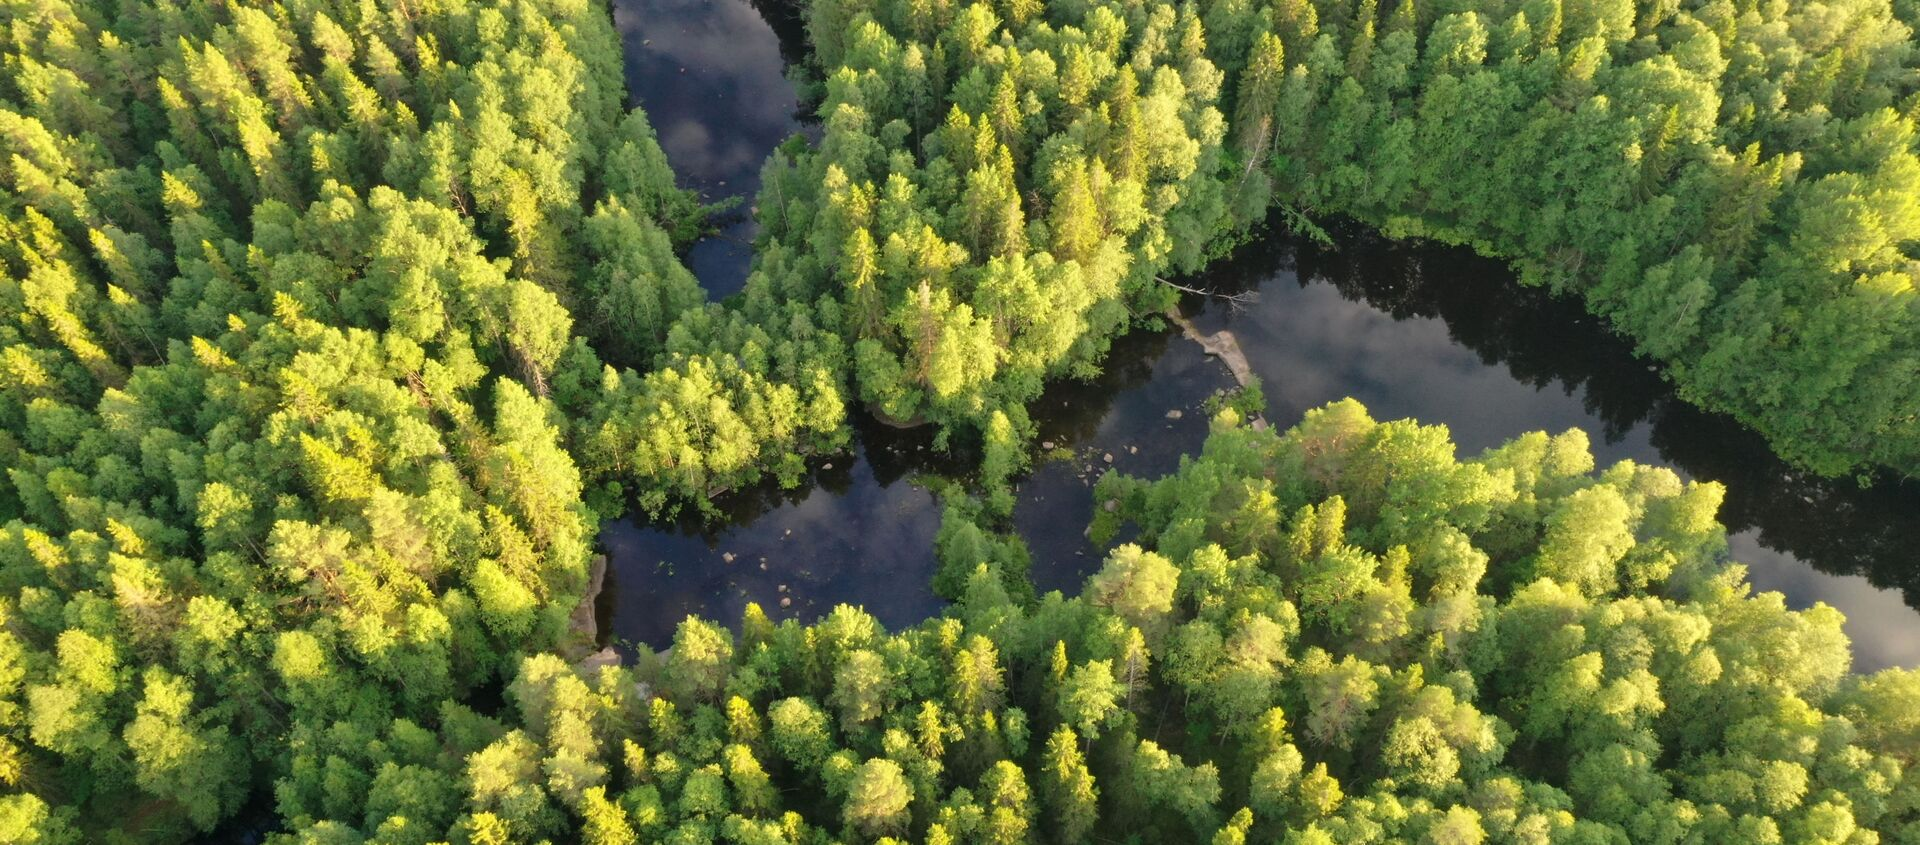 Un bosque en Rusia - Sputnik Mundo, 1920, 09.11.2020